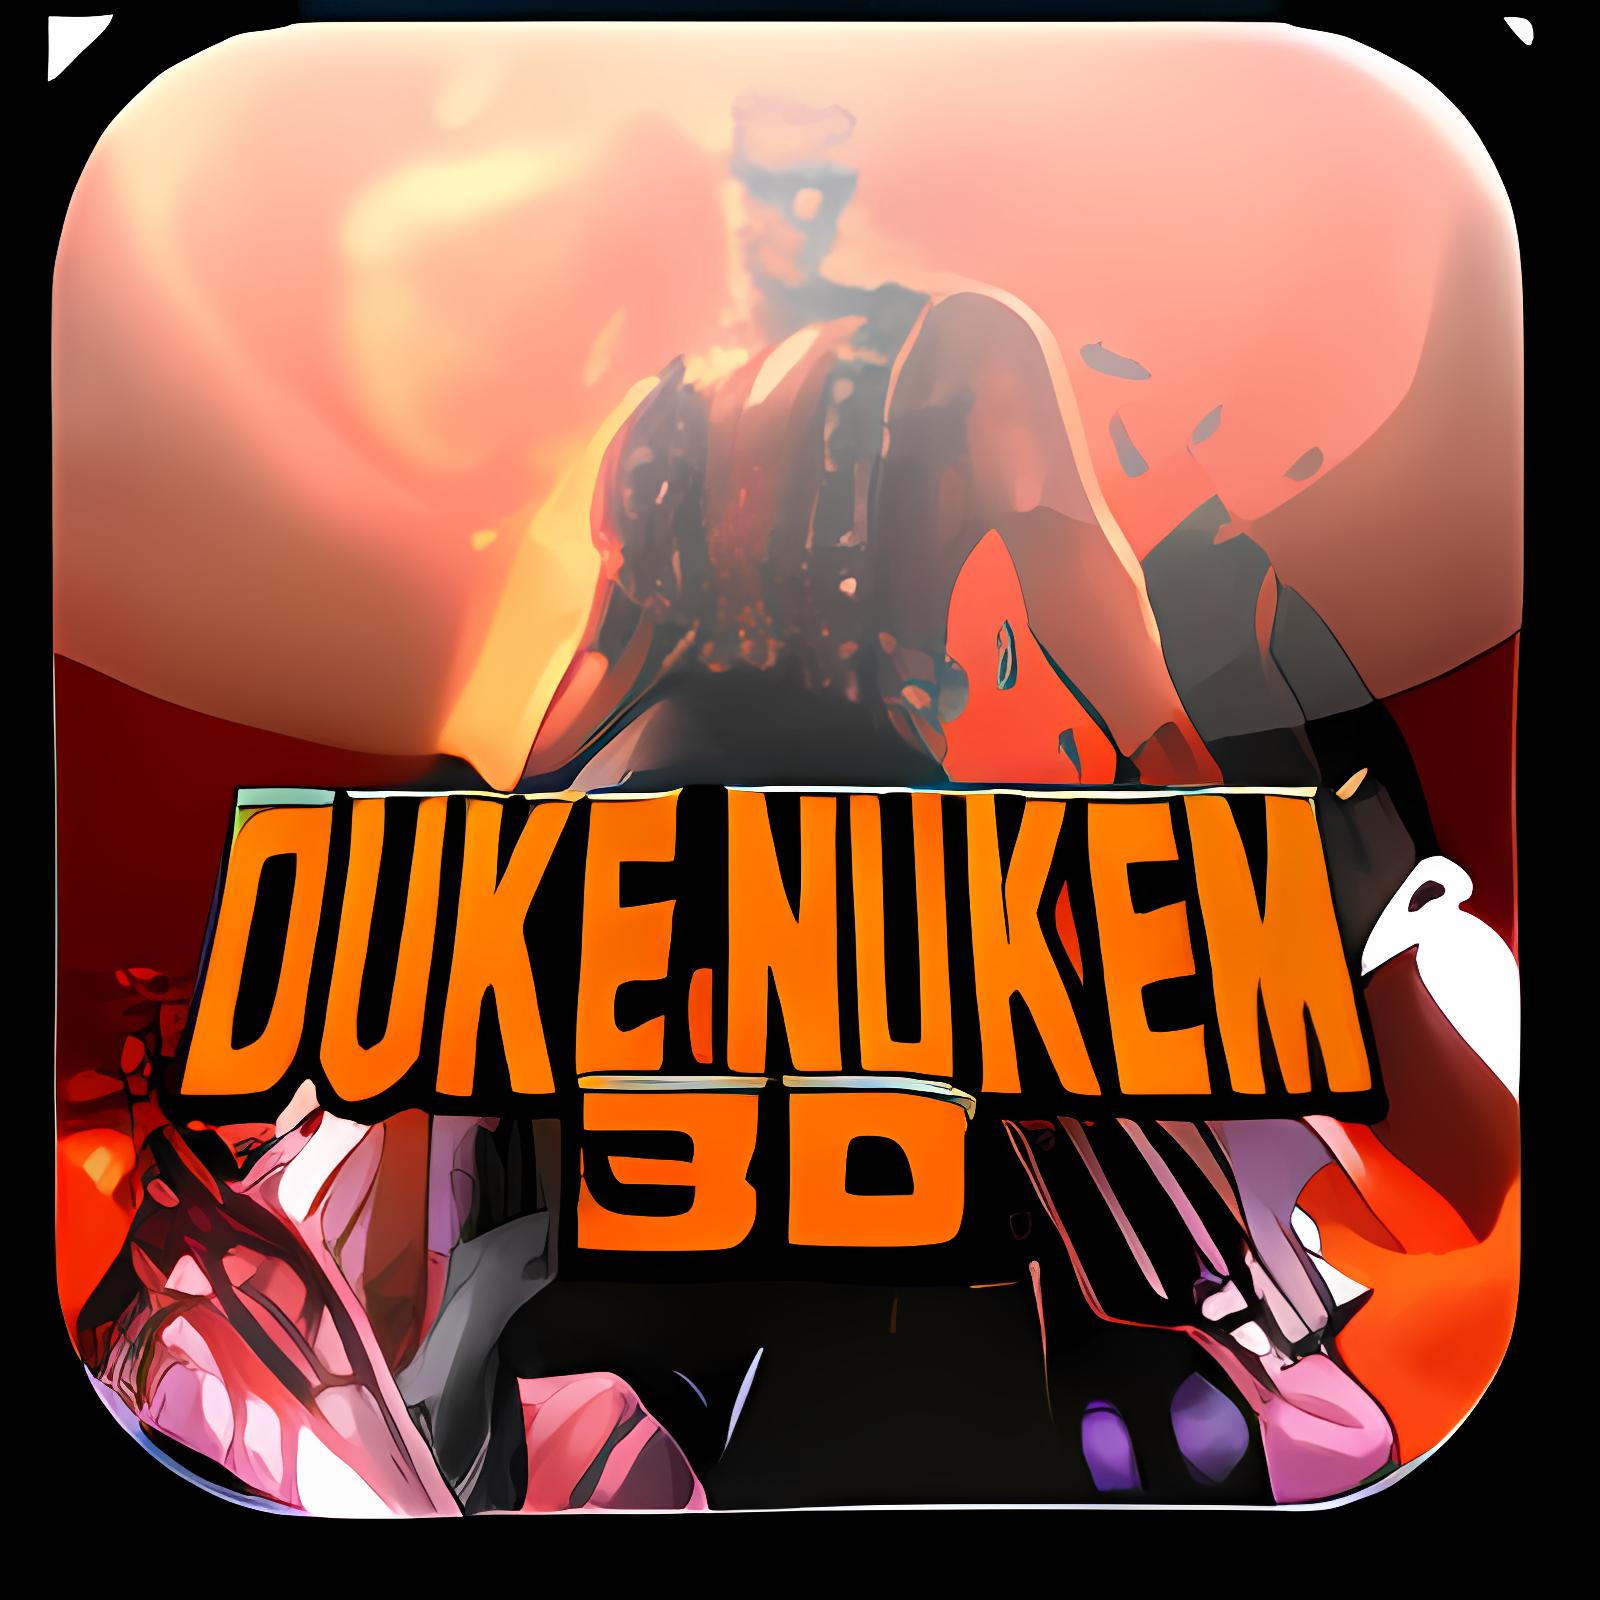 Duke Nukem 3D 1.1